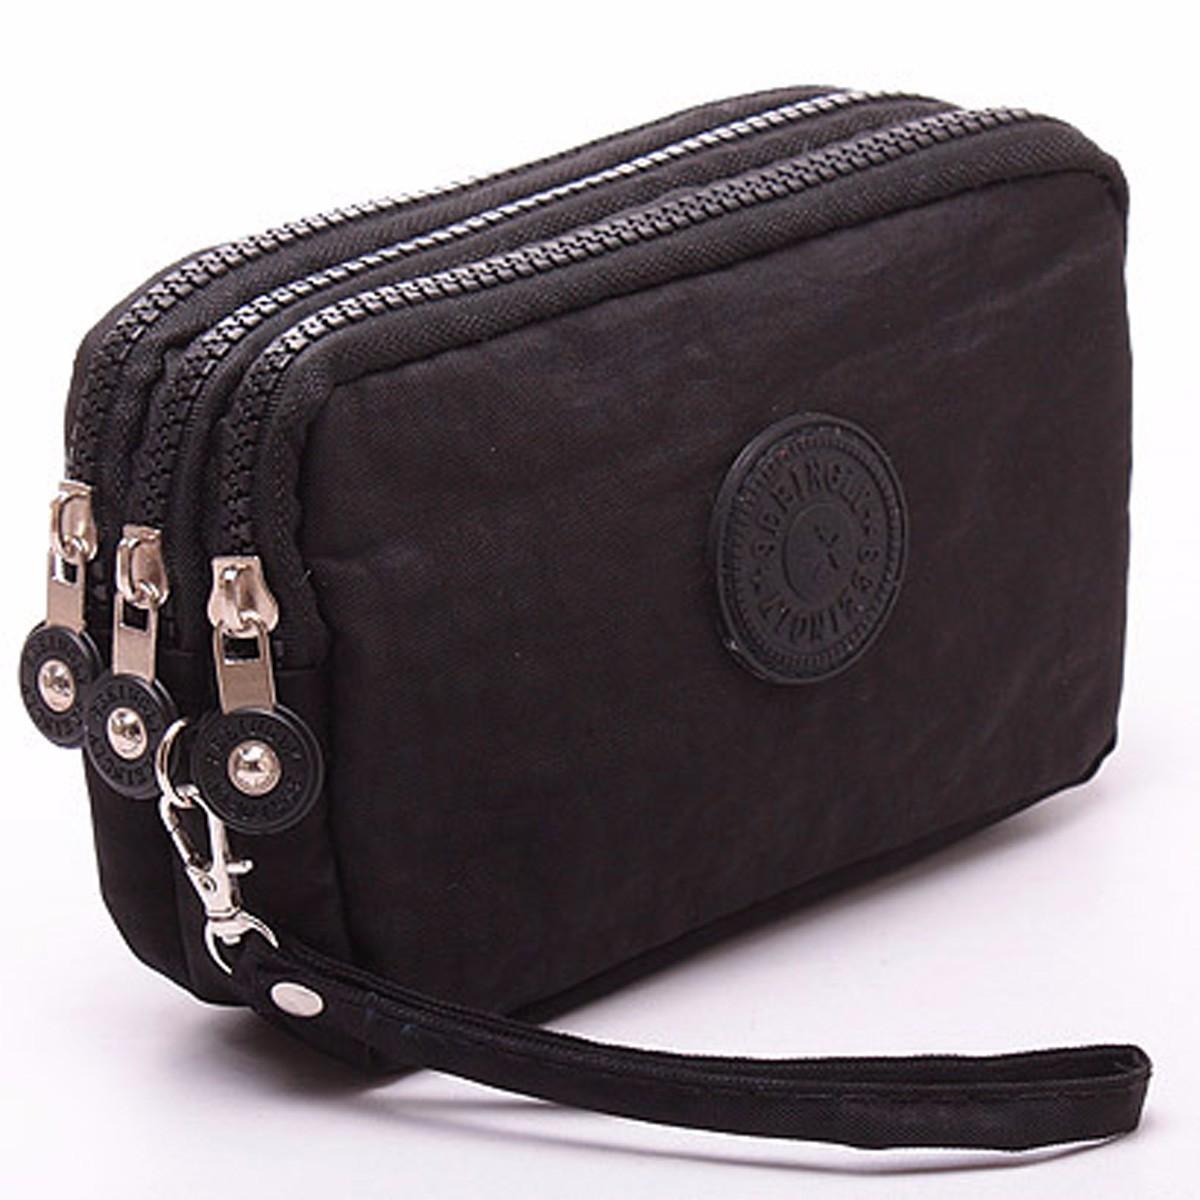 1185cd1db3e7 New Mobile Phone Hand Bag Lady Purse Fashion Women Packet